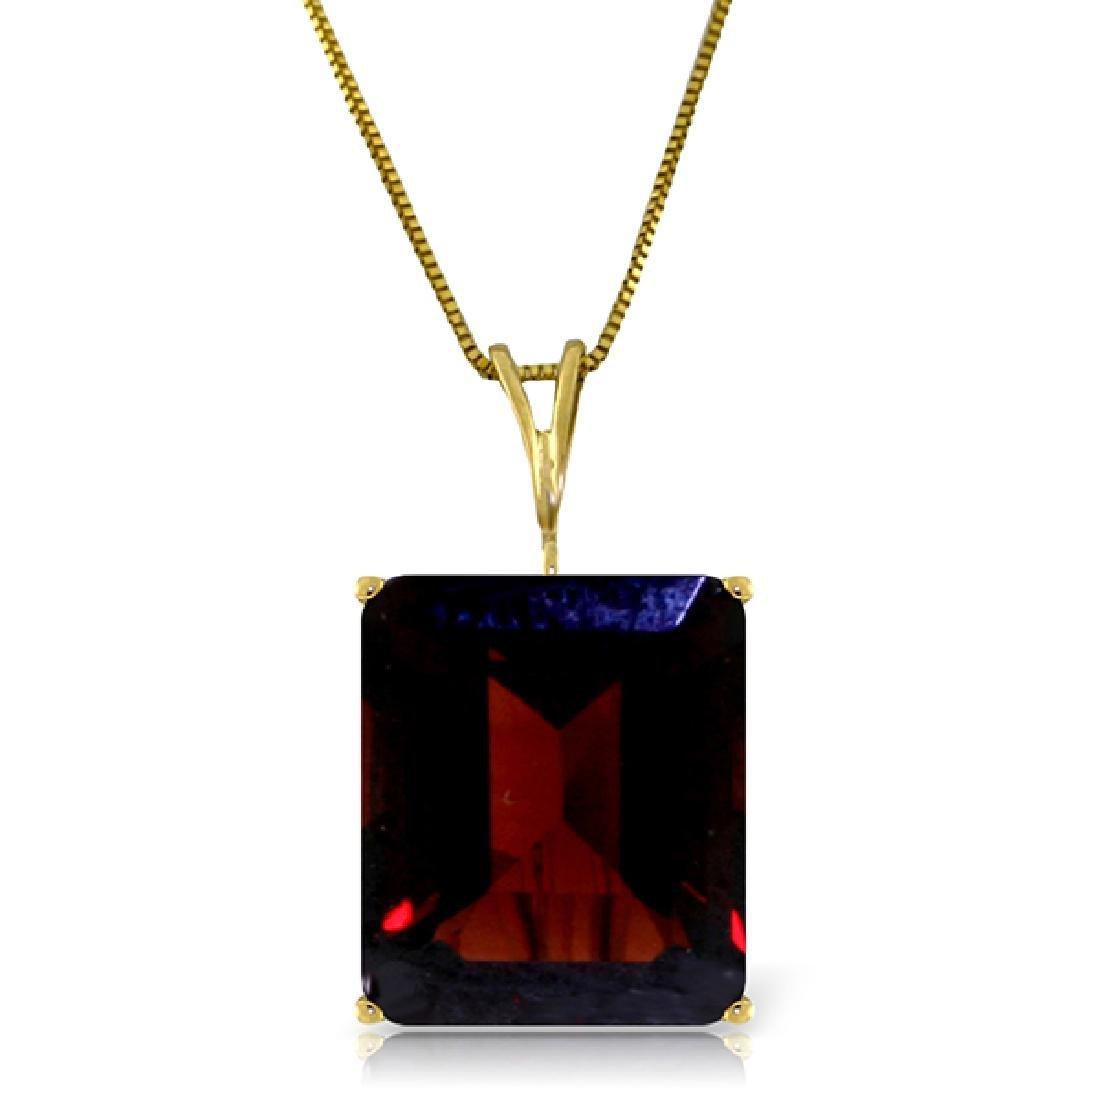 Genuine 7 ctw Garnet Necklace Jewelry 14KT Yellow Gold